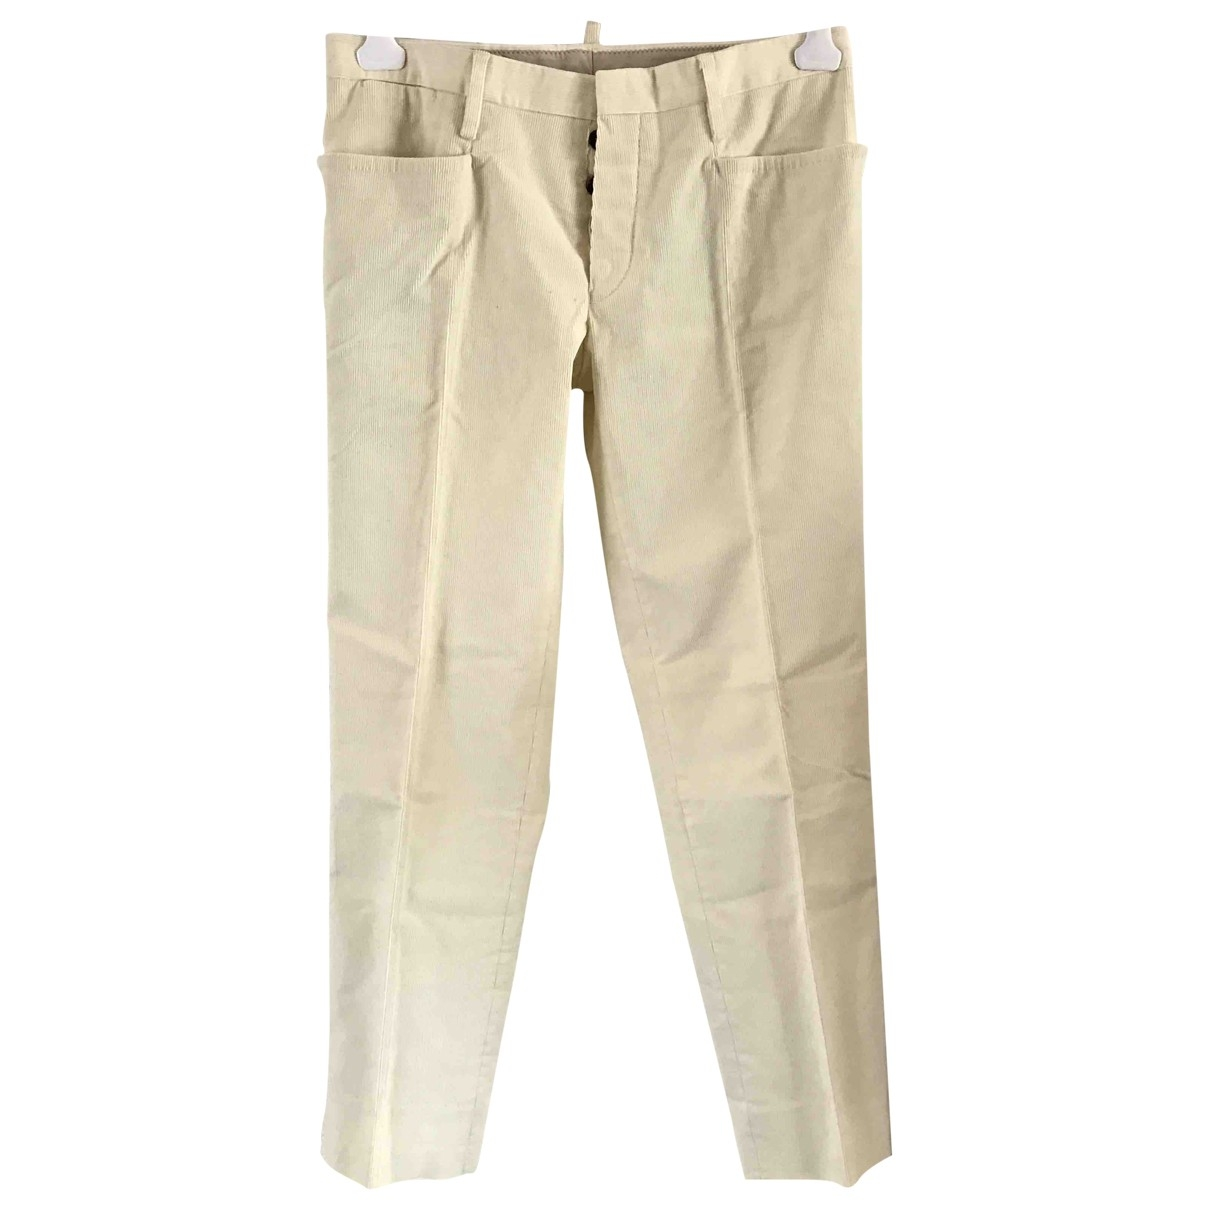 Dsquared2 \N Beige Cotton Trousers for Men 48 IT